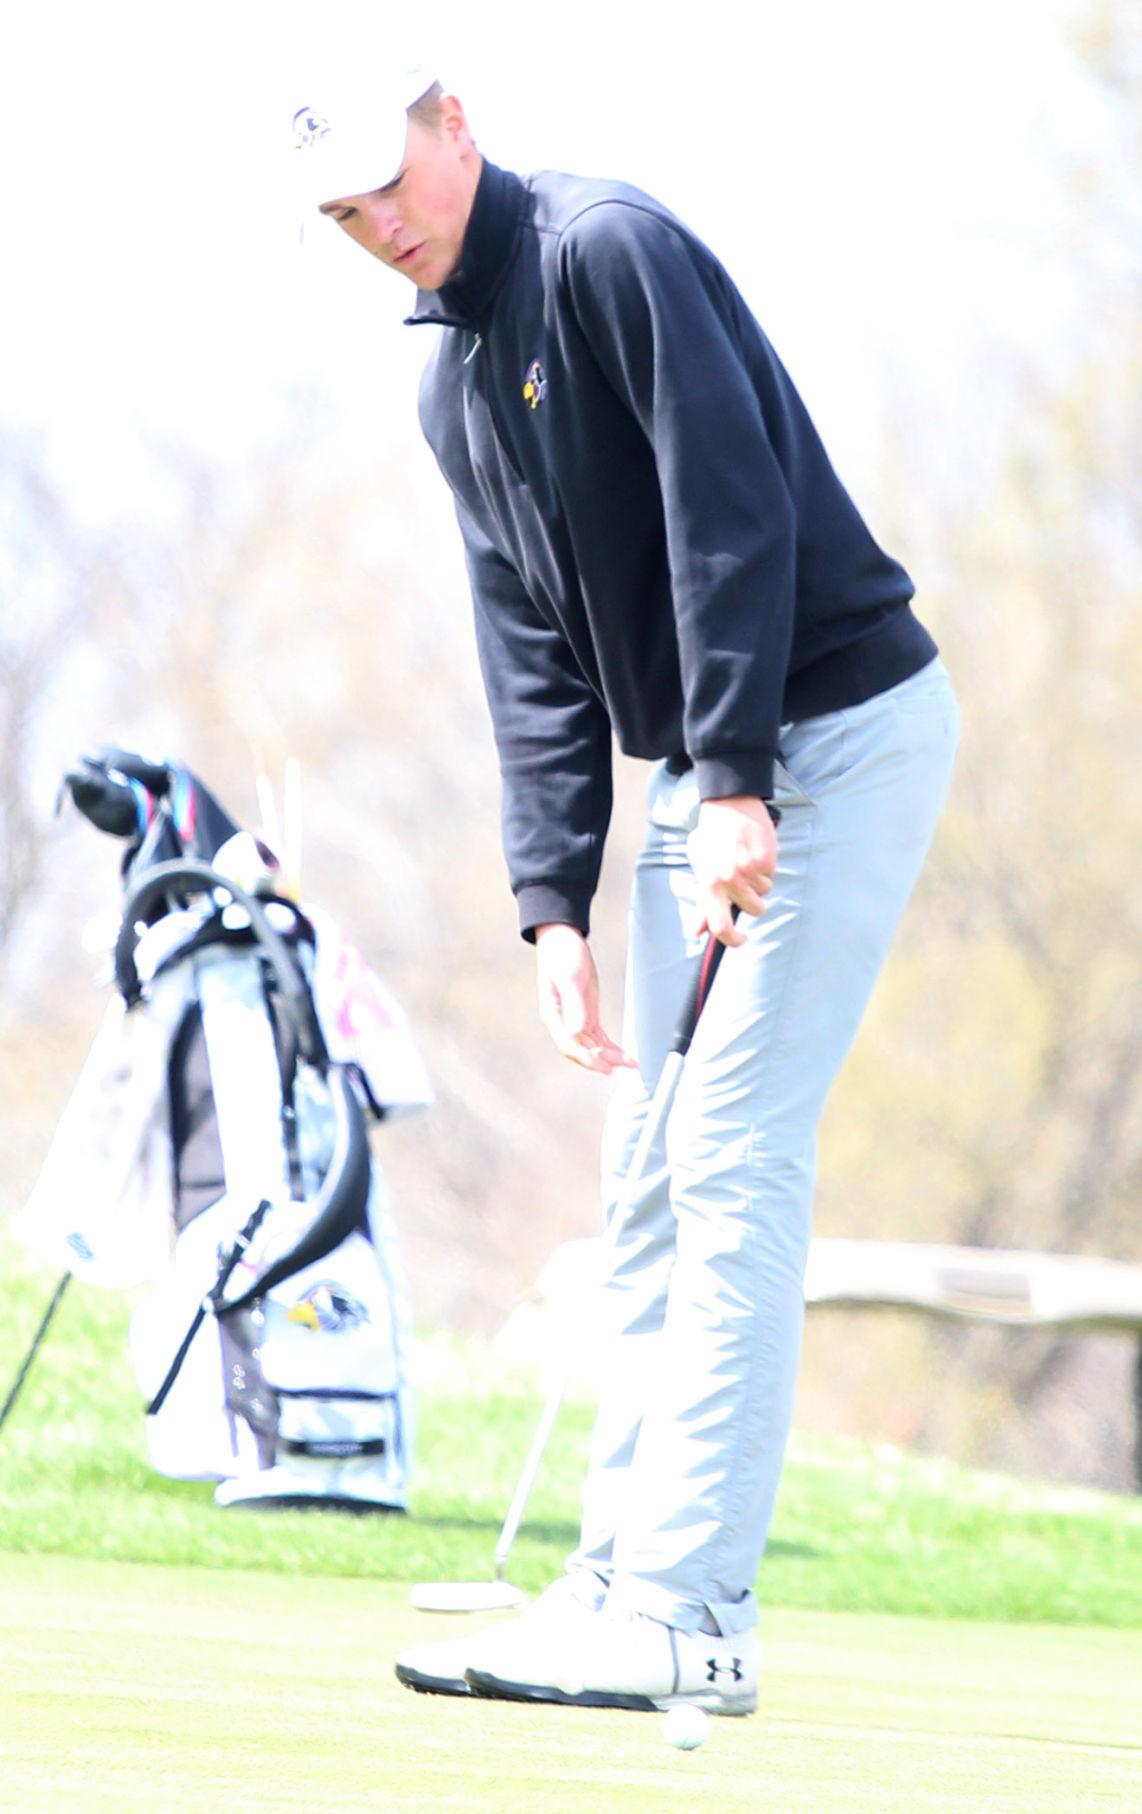 Chaska Golf - Johnson